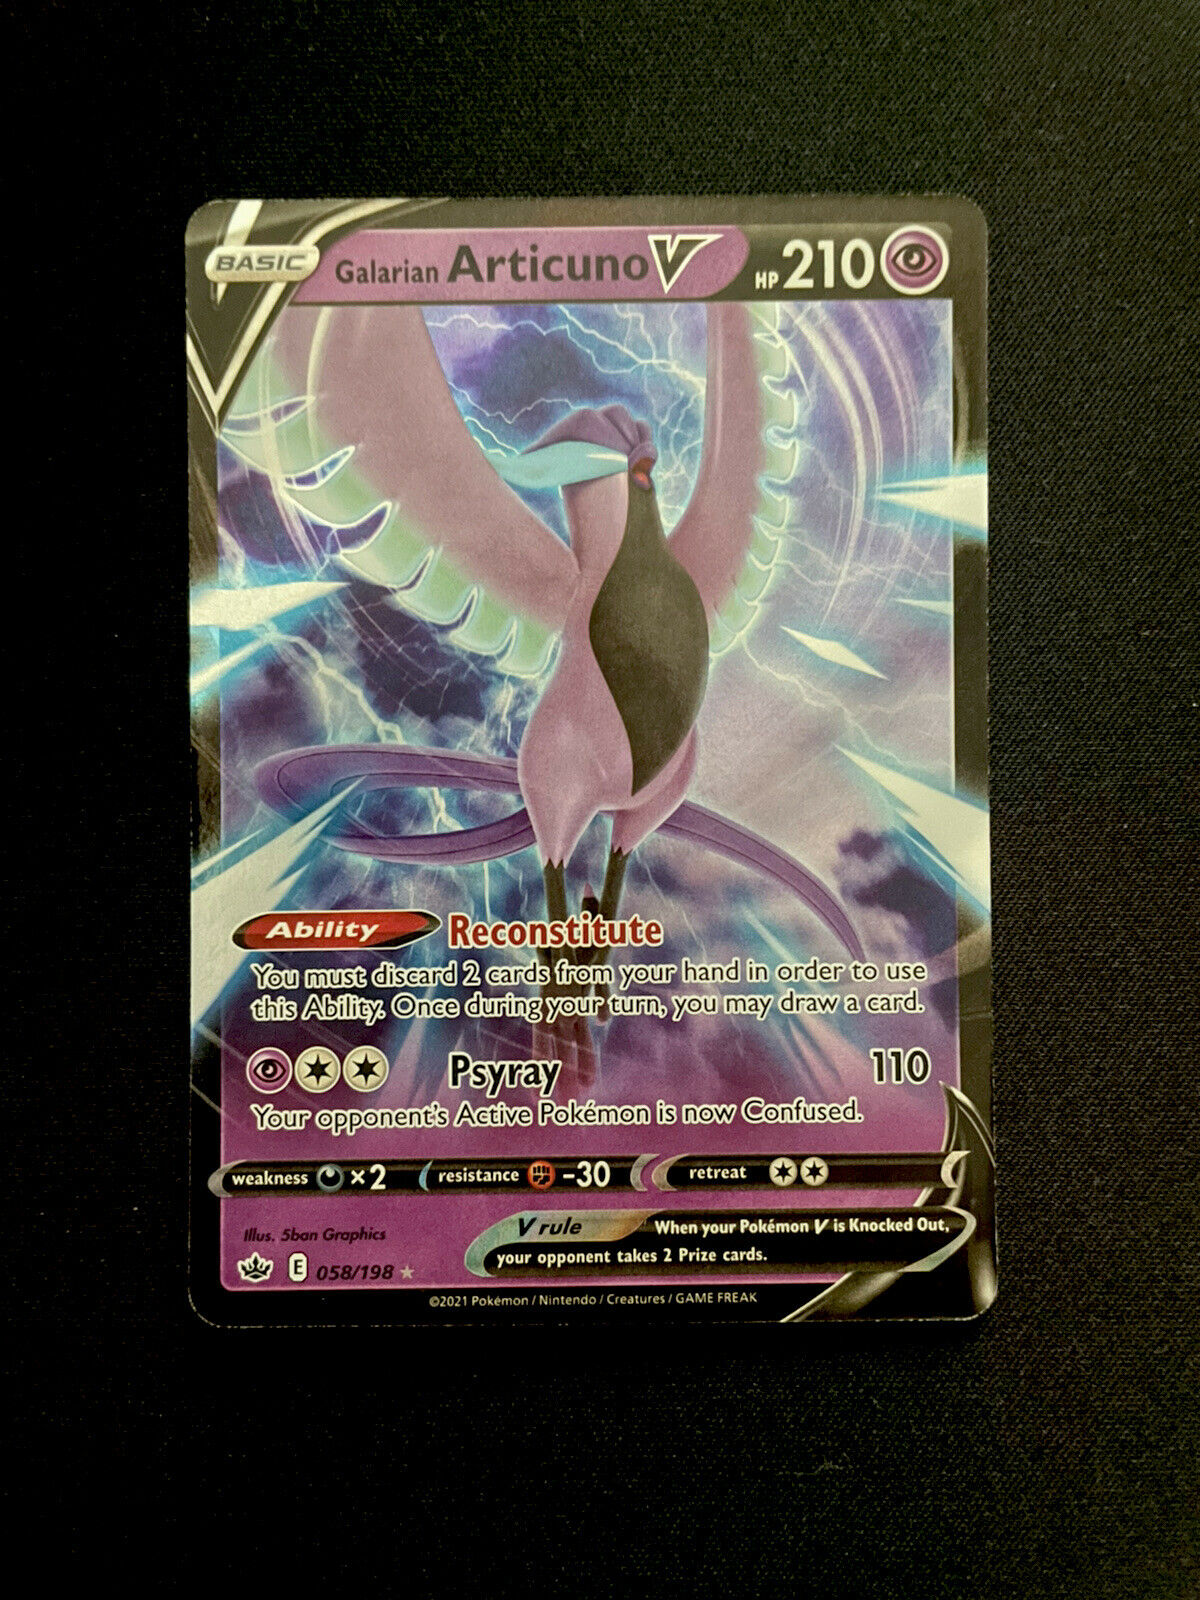 Galarian Articuno V 058/198 Pokémon TCG Chilling Reign Ultra Rare Near Mint